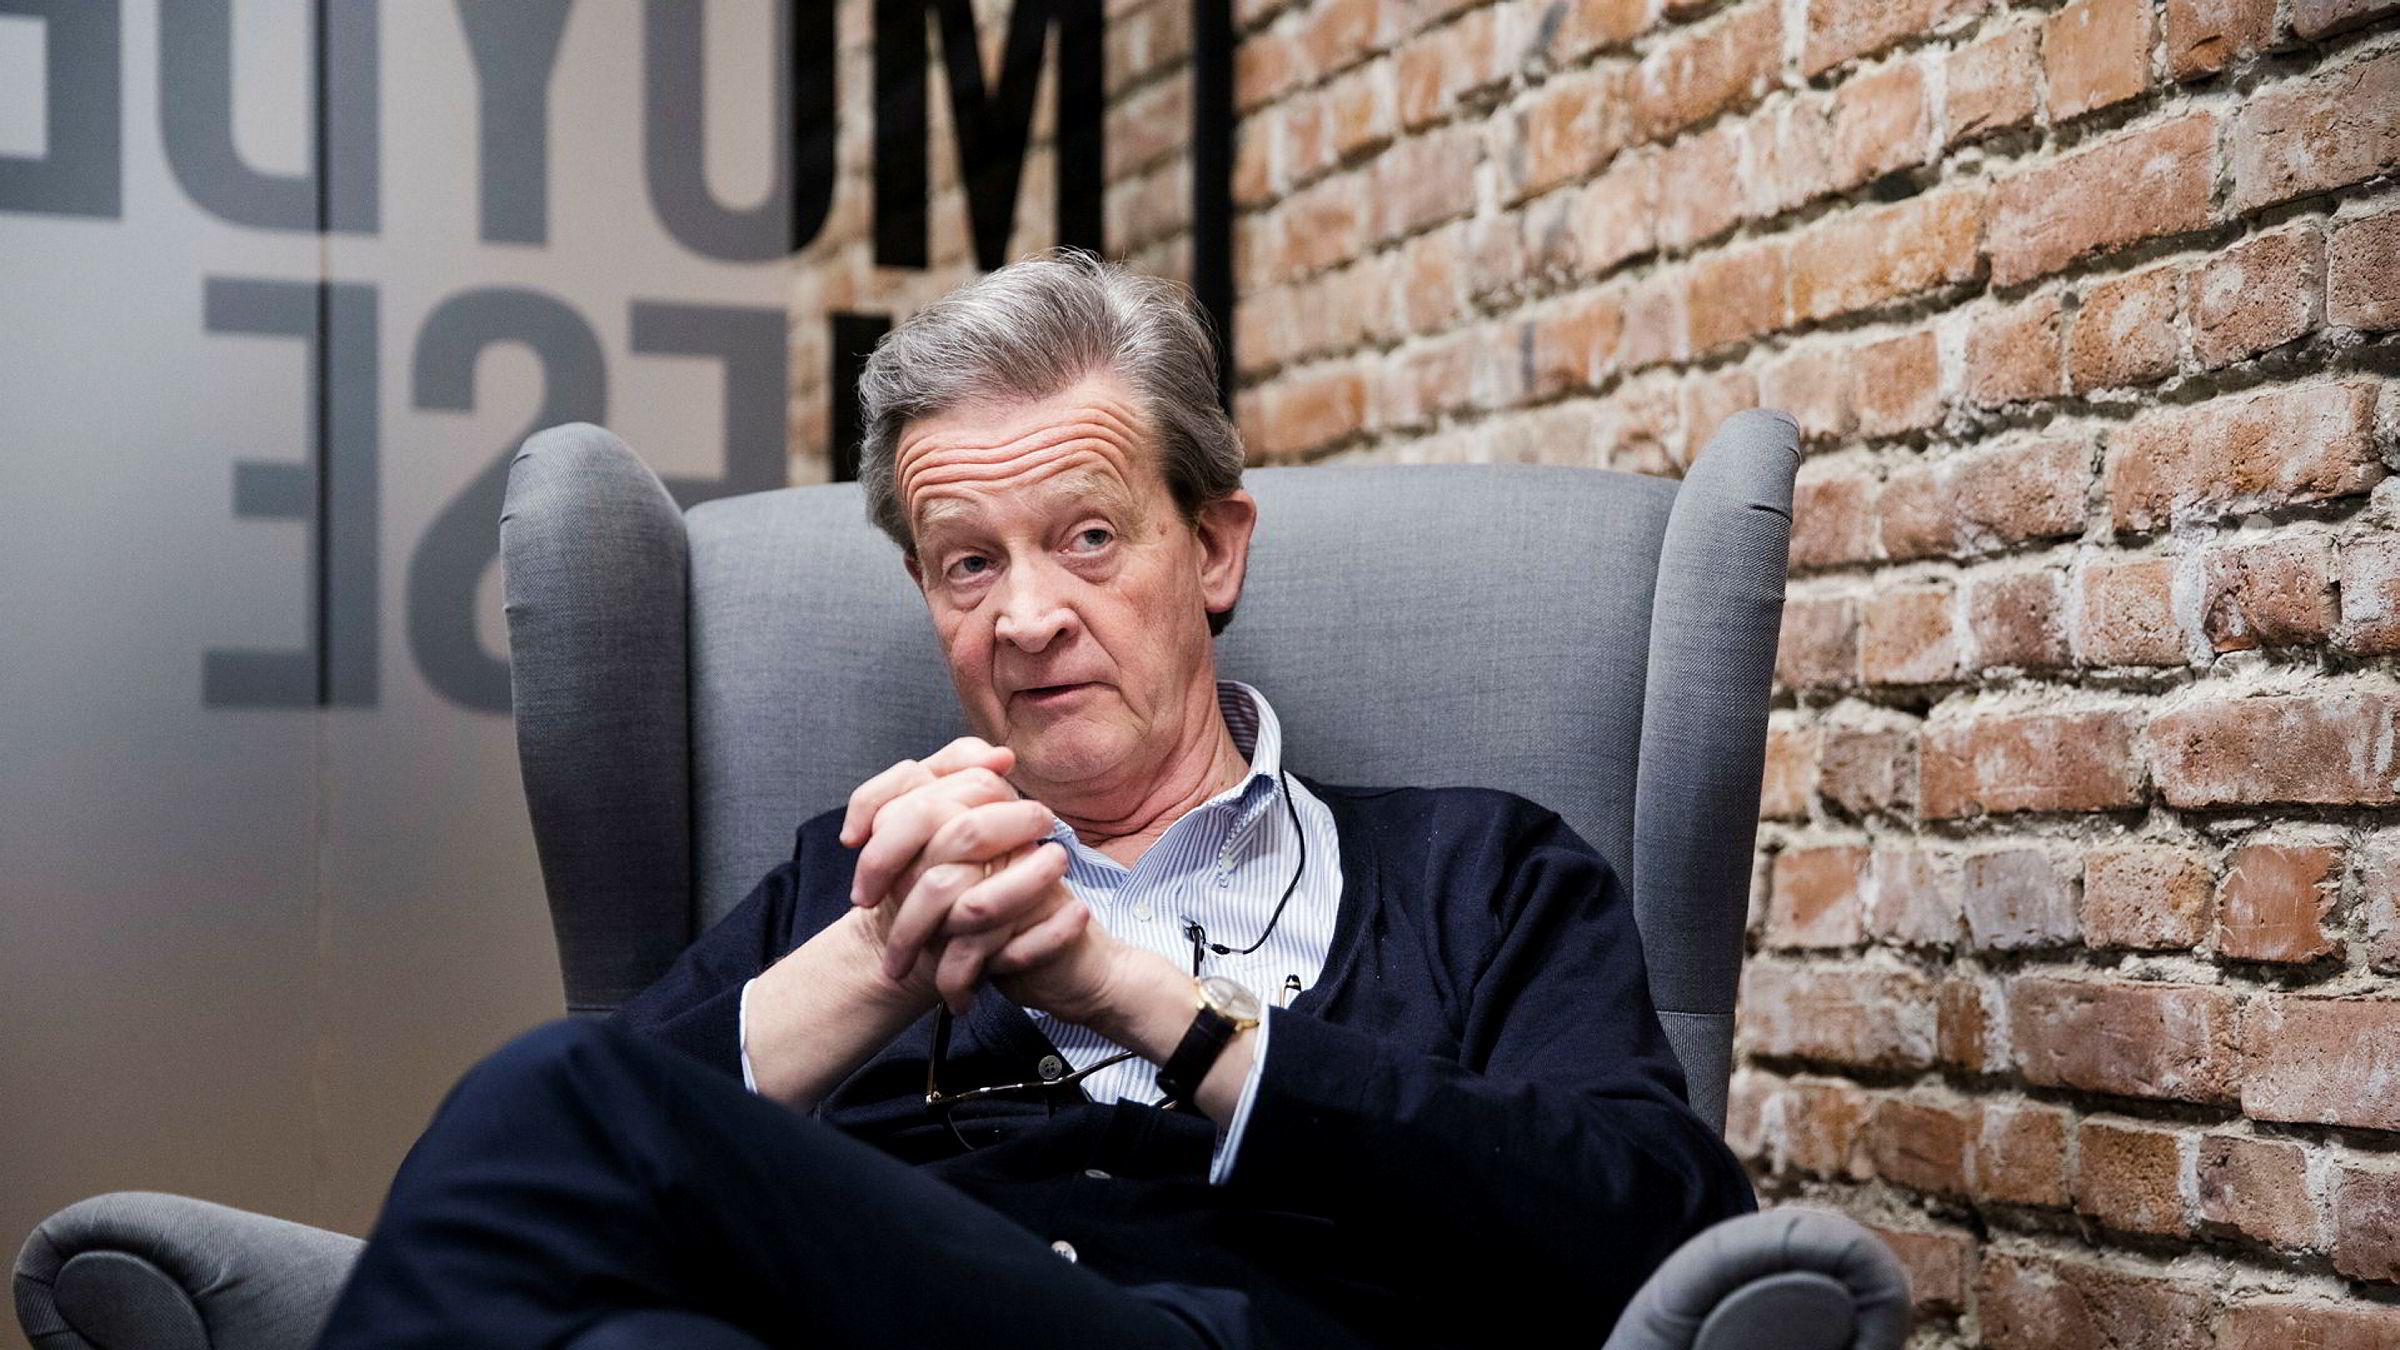 Hans Geelmuyden har ingen problemer med at Resett republiserer hans blogginnlegg.